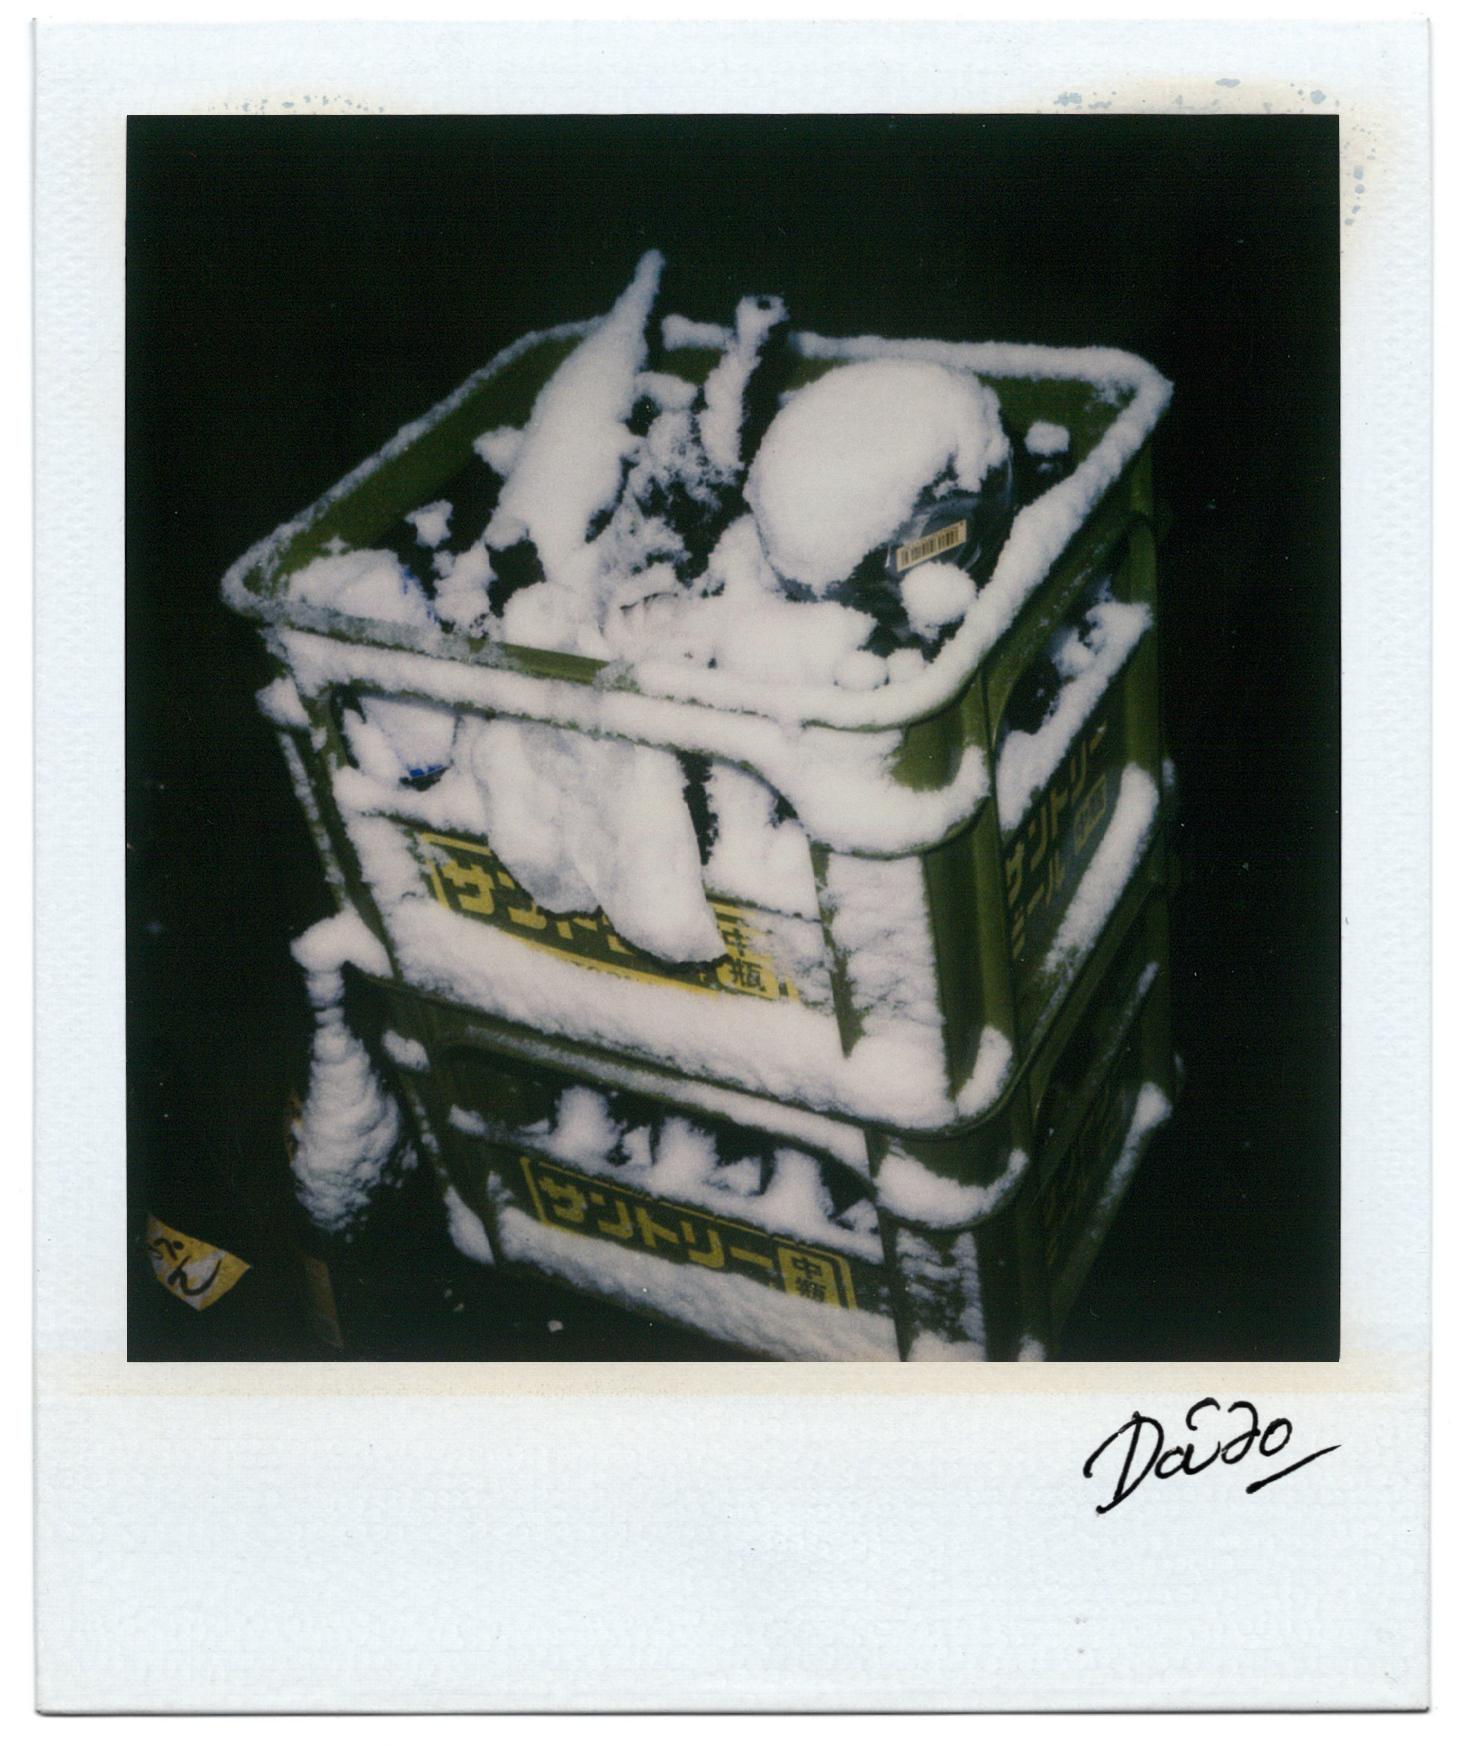 Moriyama Daido, Passage, 1998, Polaroid, 11 x 9 cm1